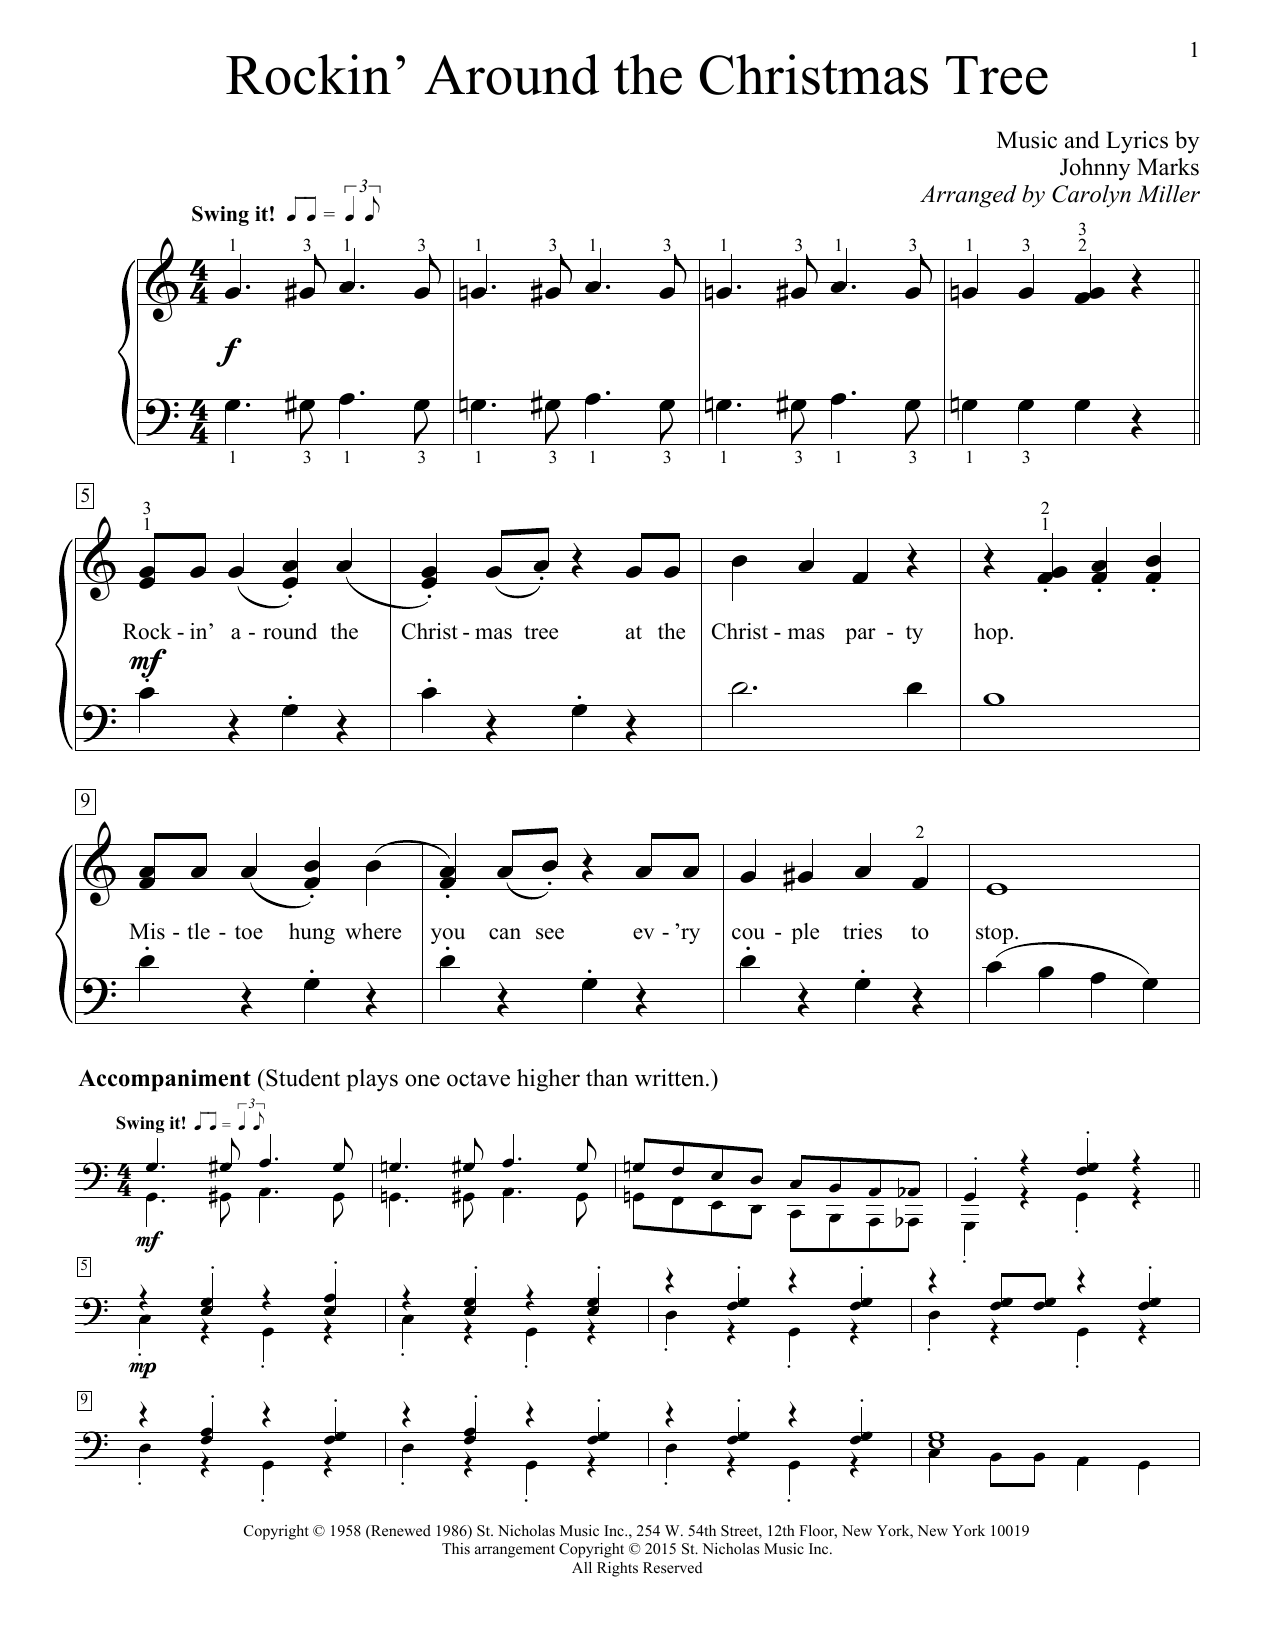 Rockin Around The Christmas Tree Piano Sheet Music.Carolyn Miller Rockin Around The Christmas Tree Sheet Music Notes Chords Download Printable Educational Piano Sku 161437